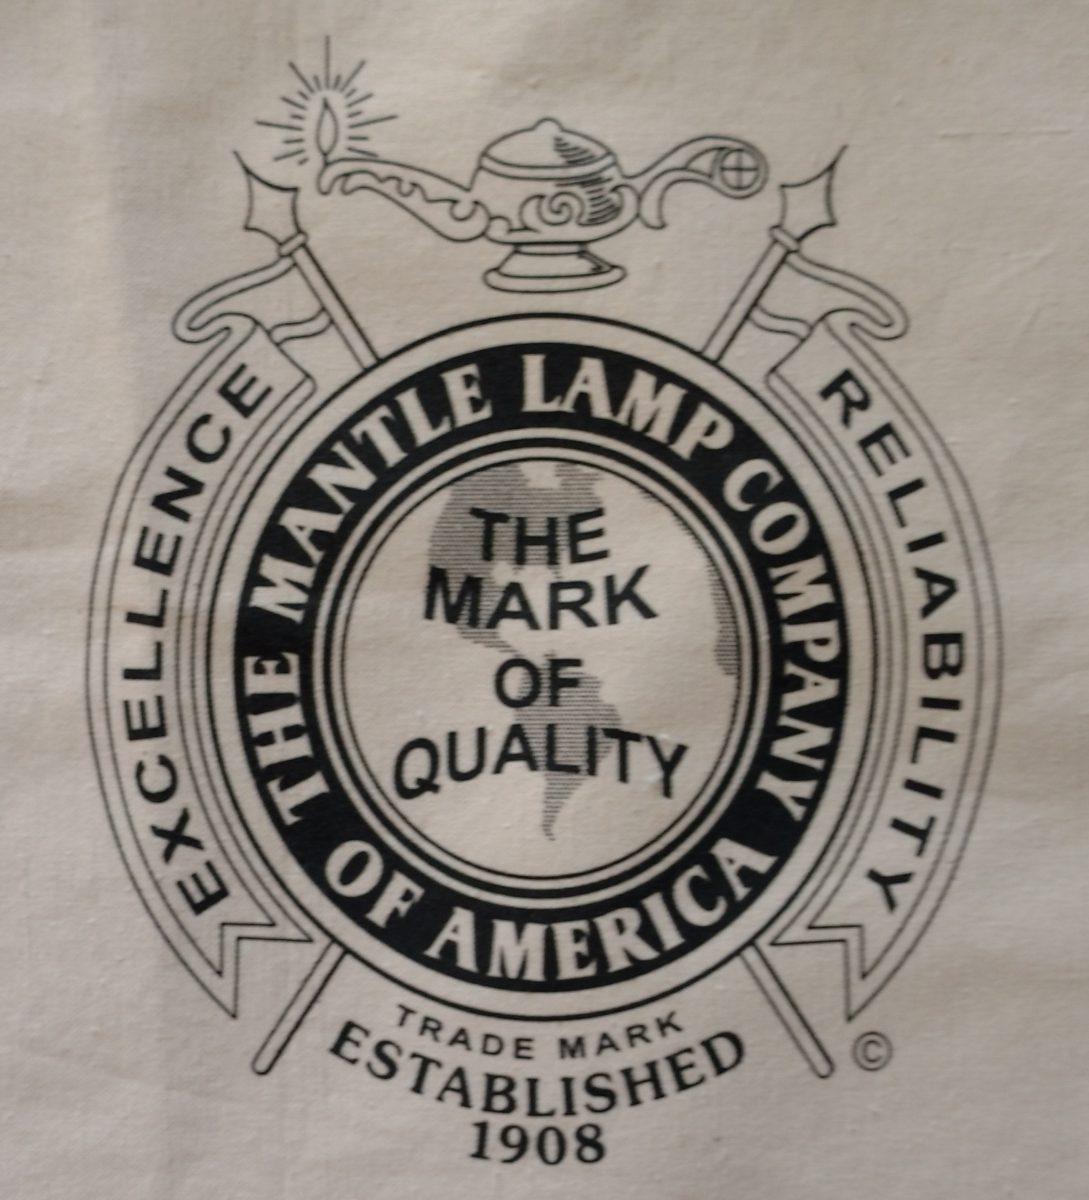 Aladdin Lamp Book Bag With 1908 Crest Logo Design